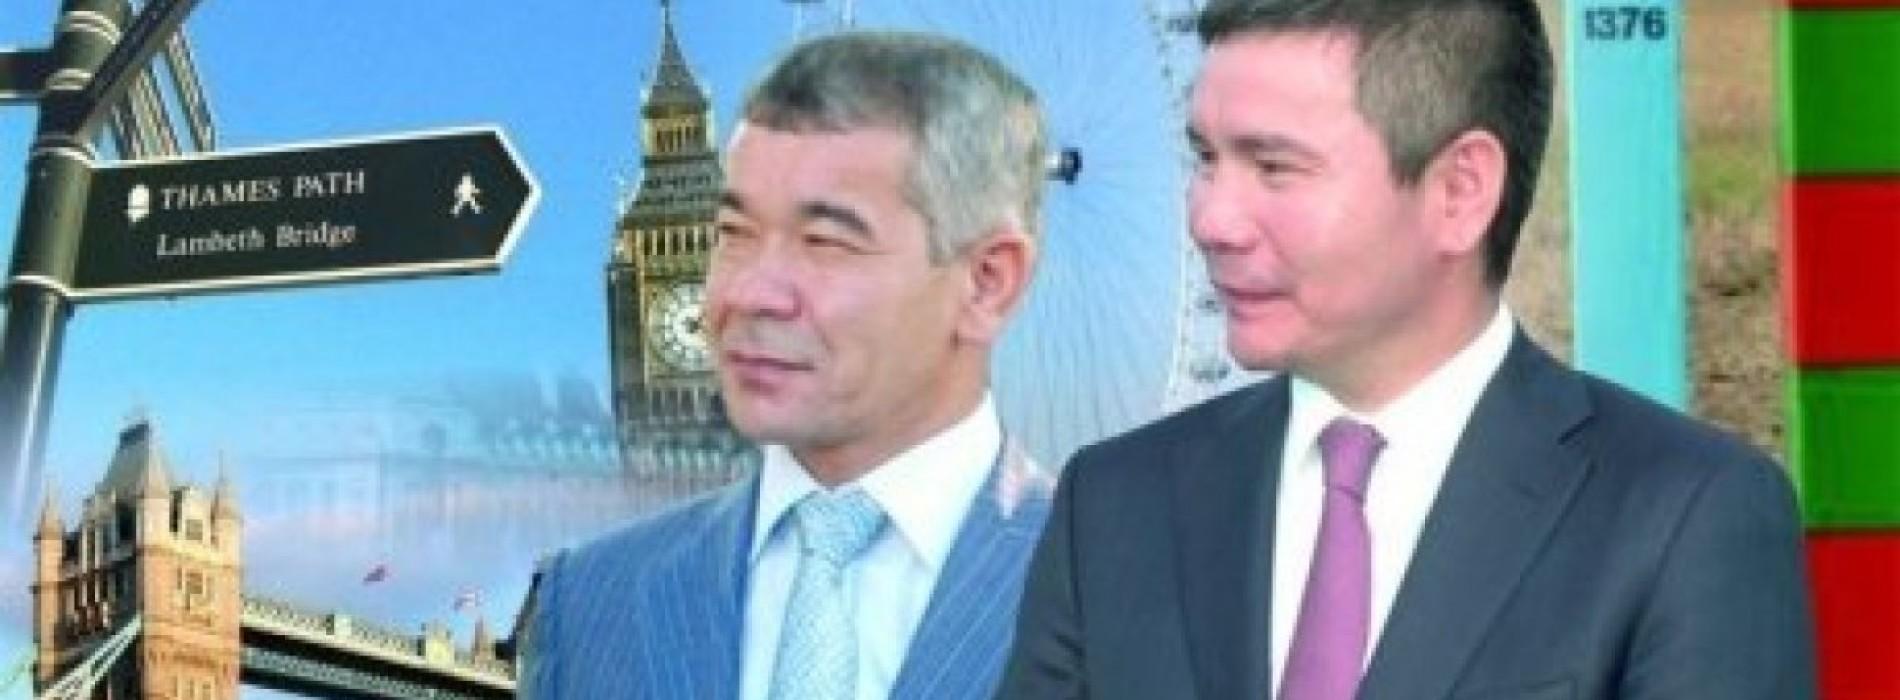 Дело экс-акима Бергея Рыскалиева не завершено